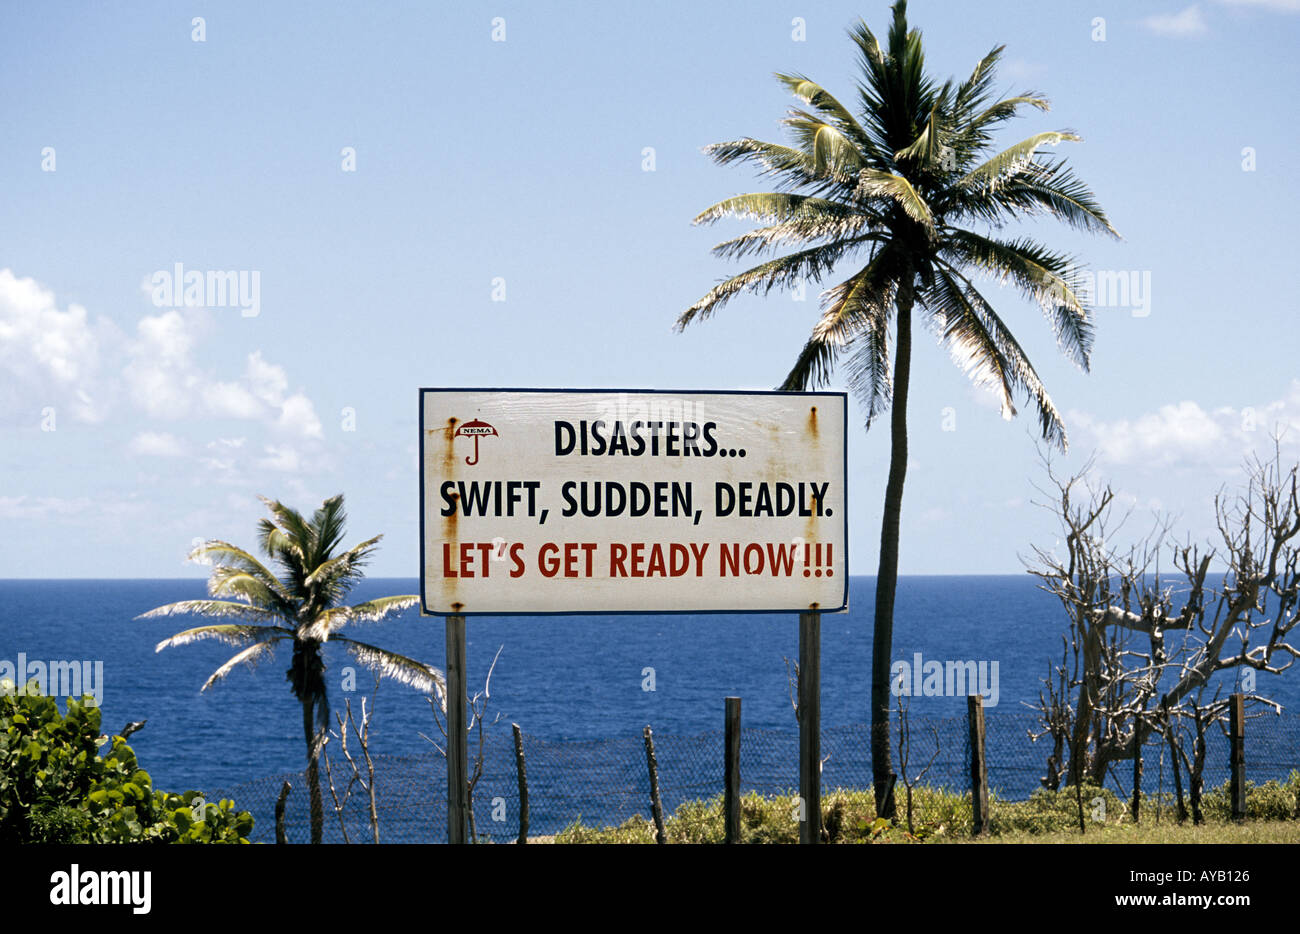 Hurricane warning sign in St Kitts in caribbean - Stock Image